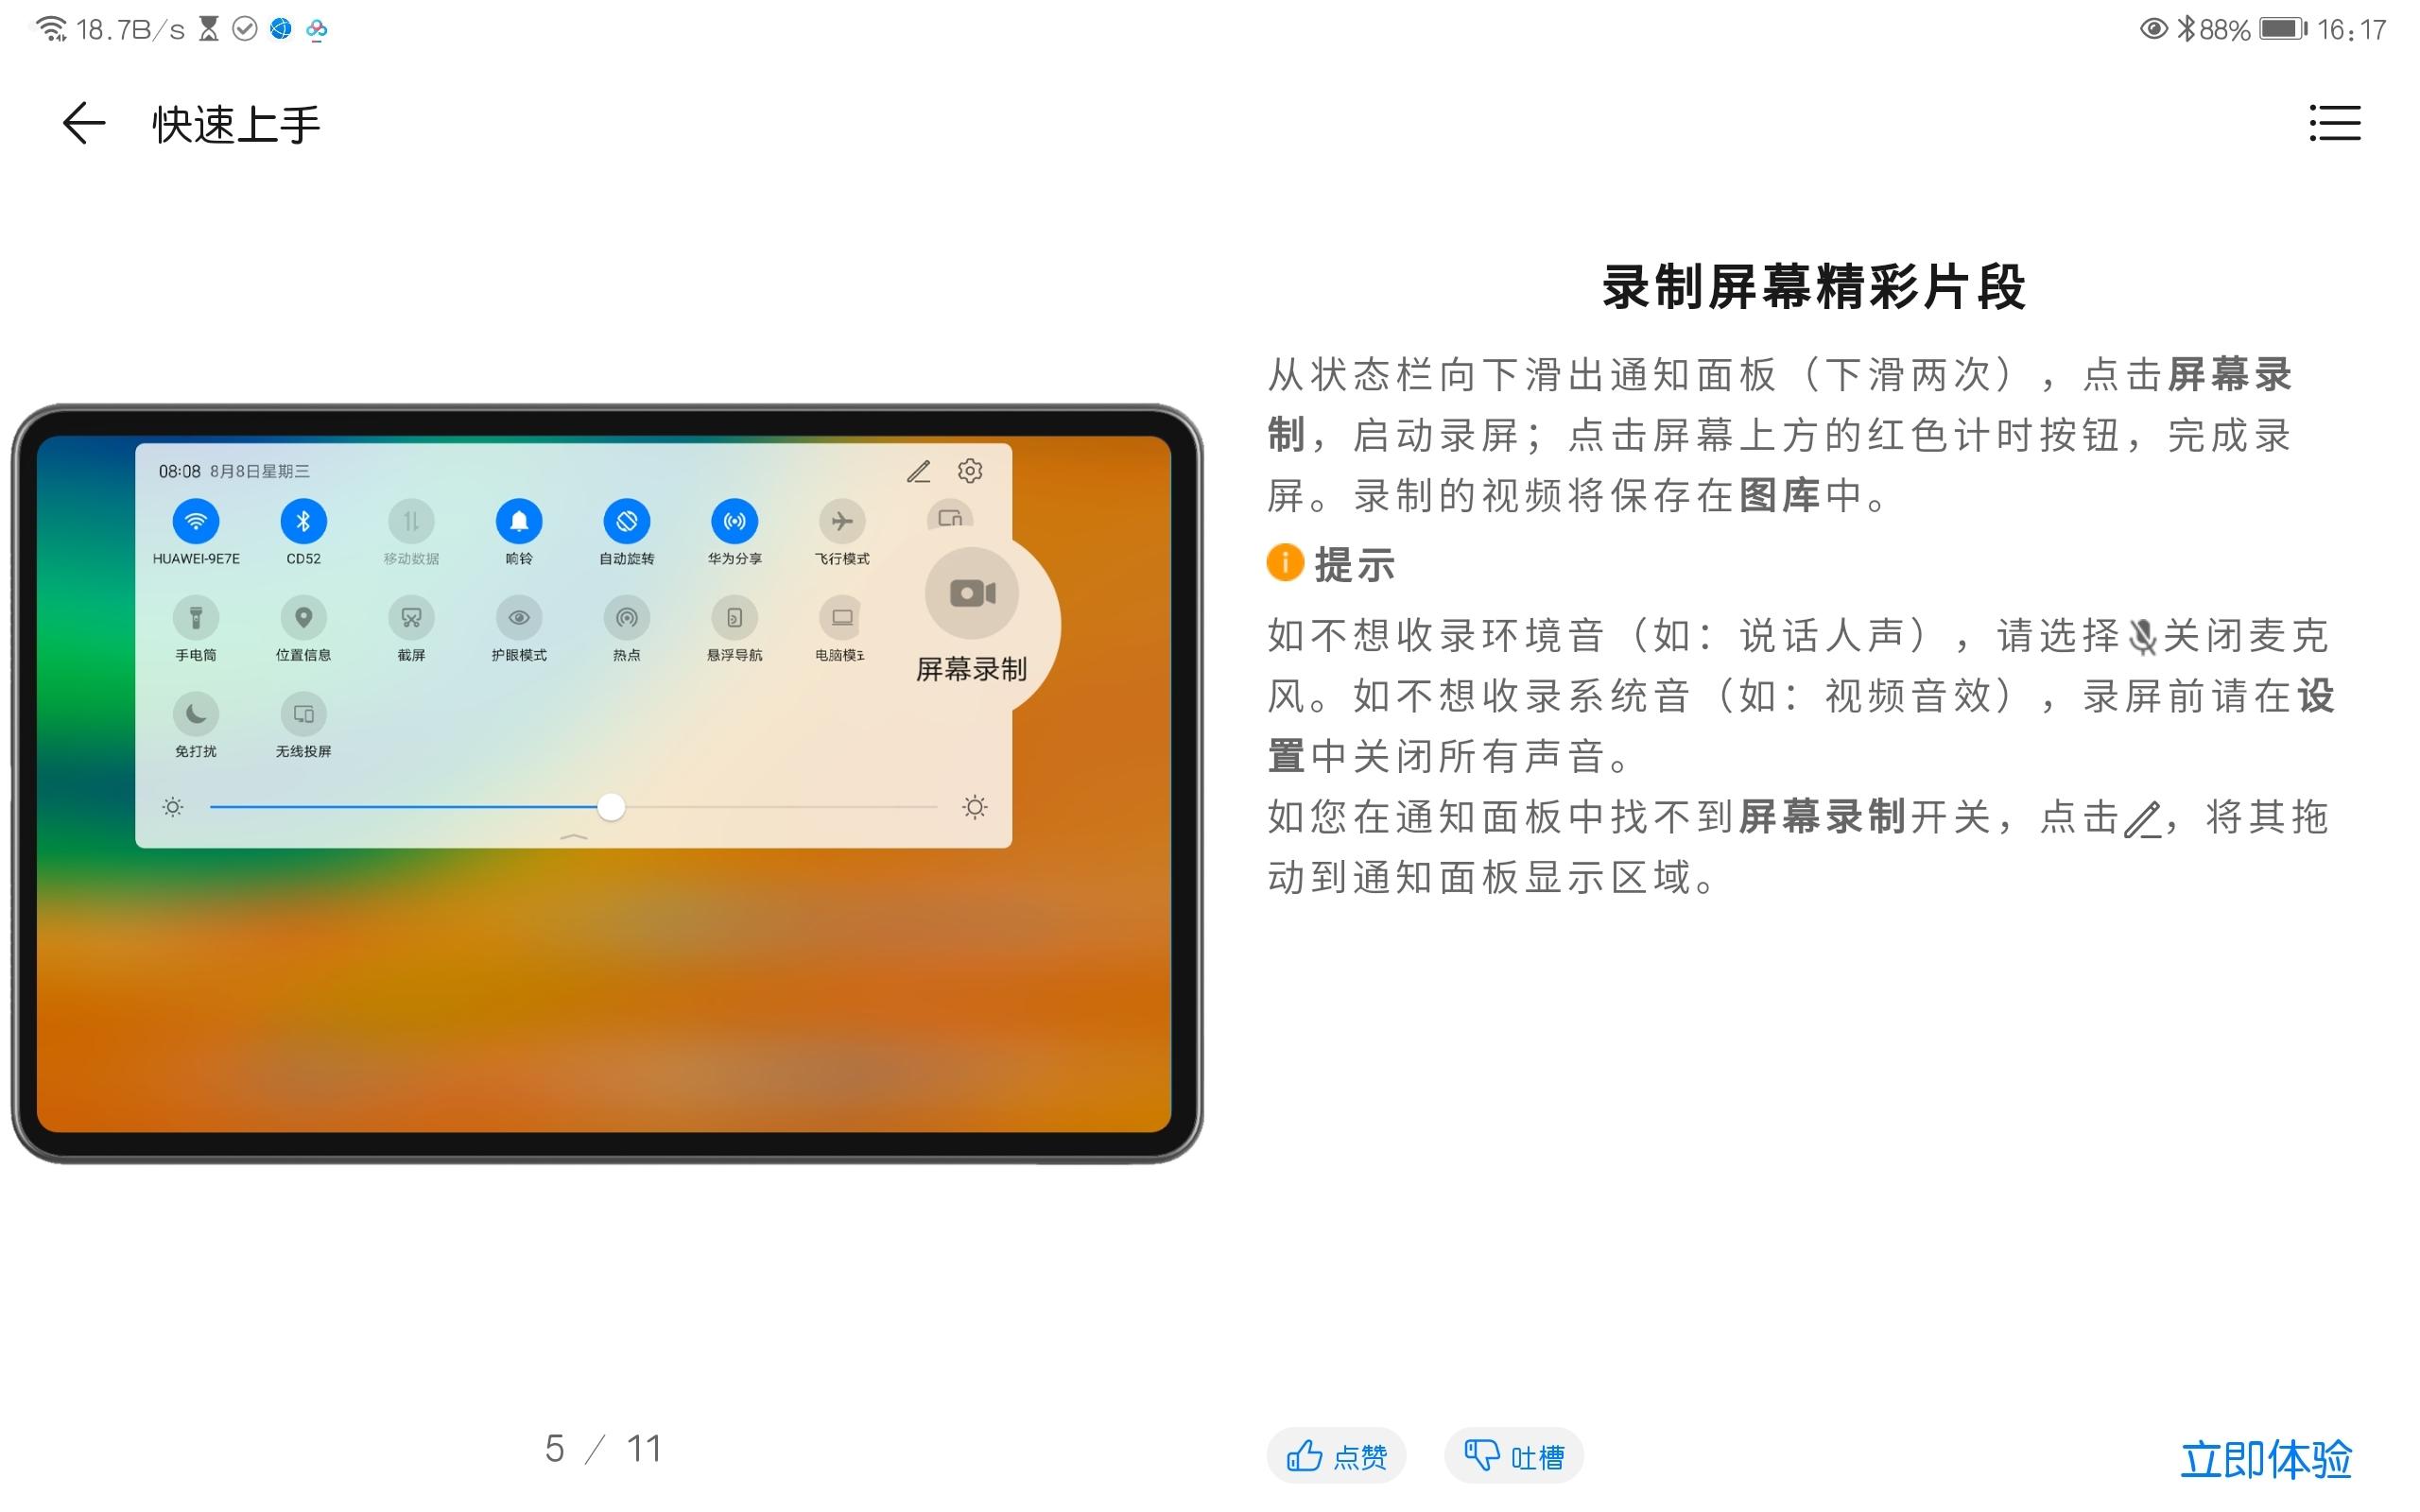 Screenshot_20200521_161716_com.huawei.android.tips.jpg